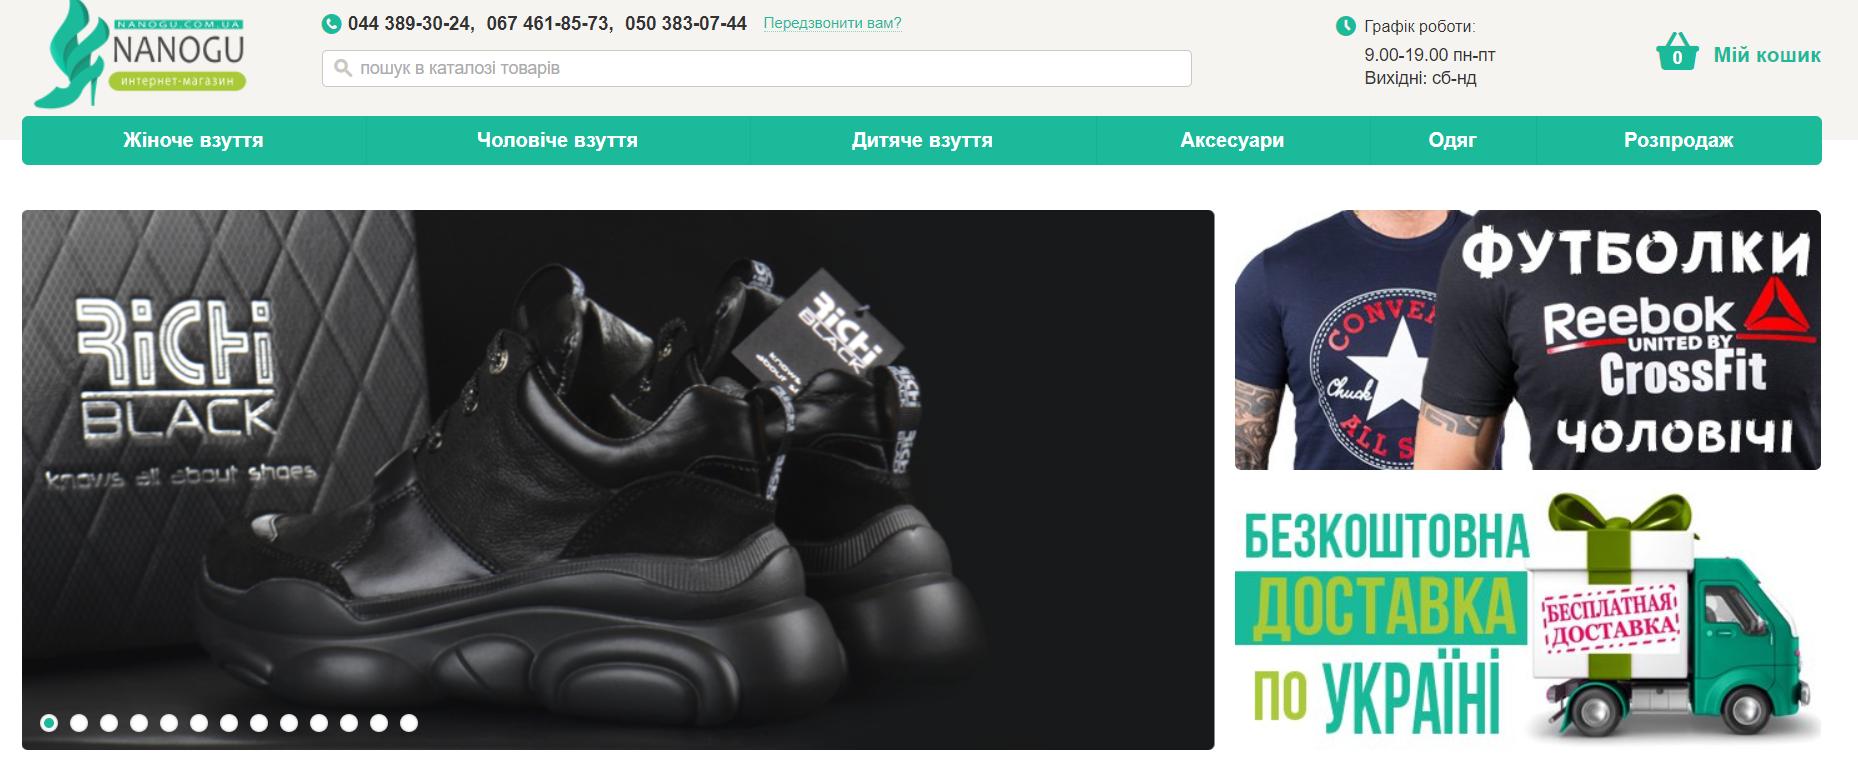 Интернет-магазин обуви NANOGU